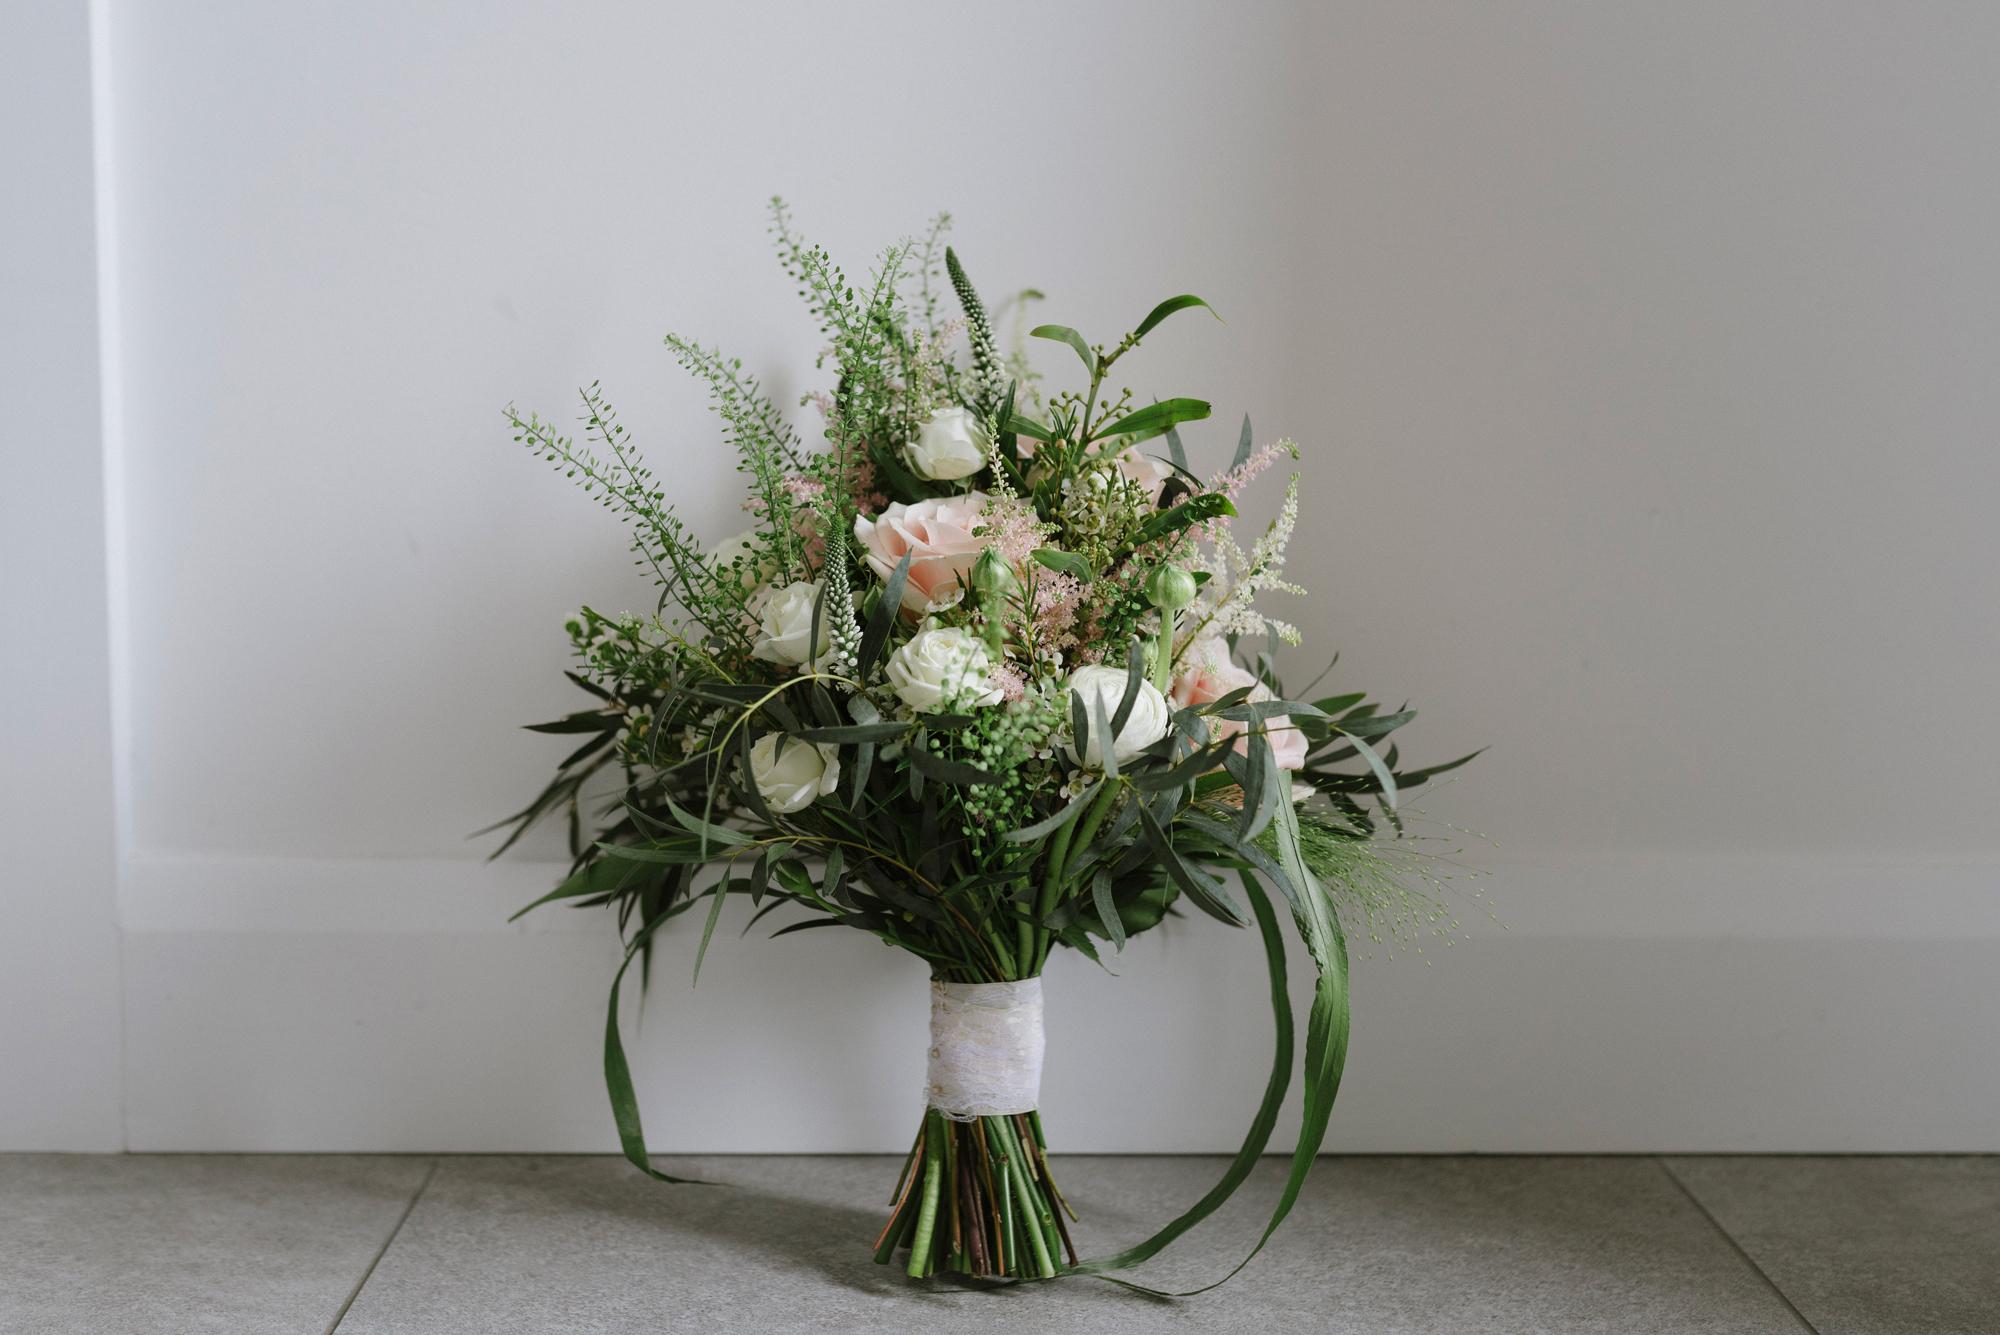 ghan_house_Wedding_Sarah_Fyffe_wedding_photographyer_2.jpg